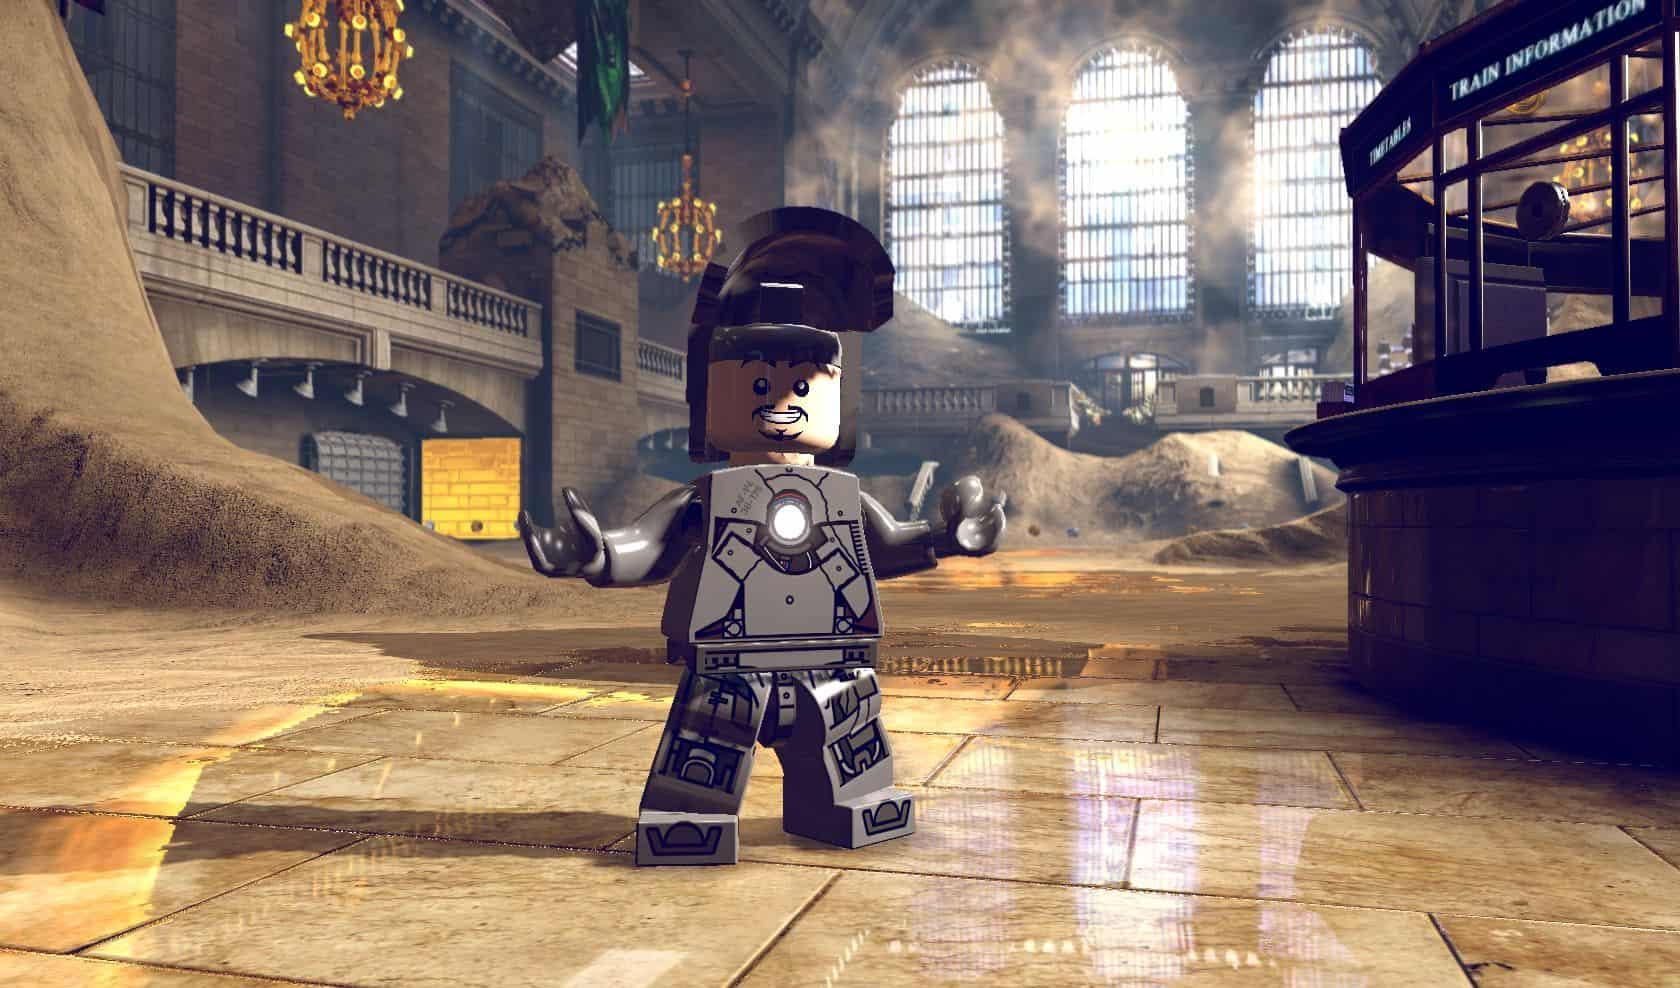 Lego-Marvel-Super-Heroes игры для детей ps4